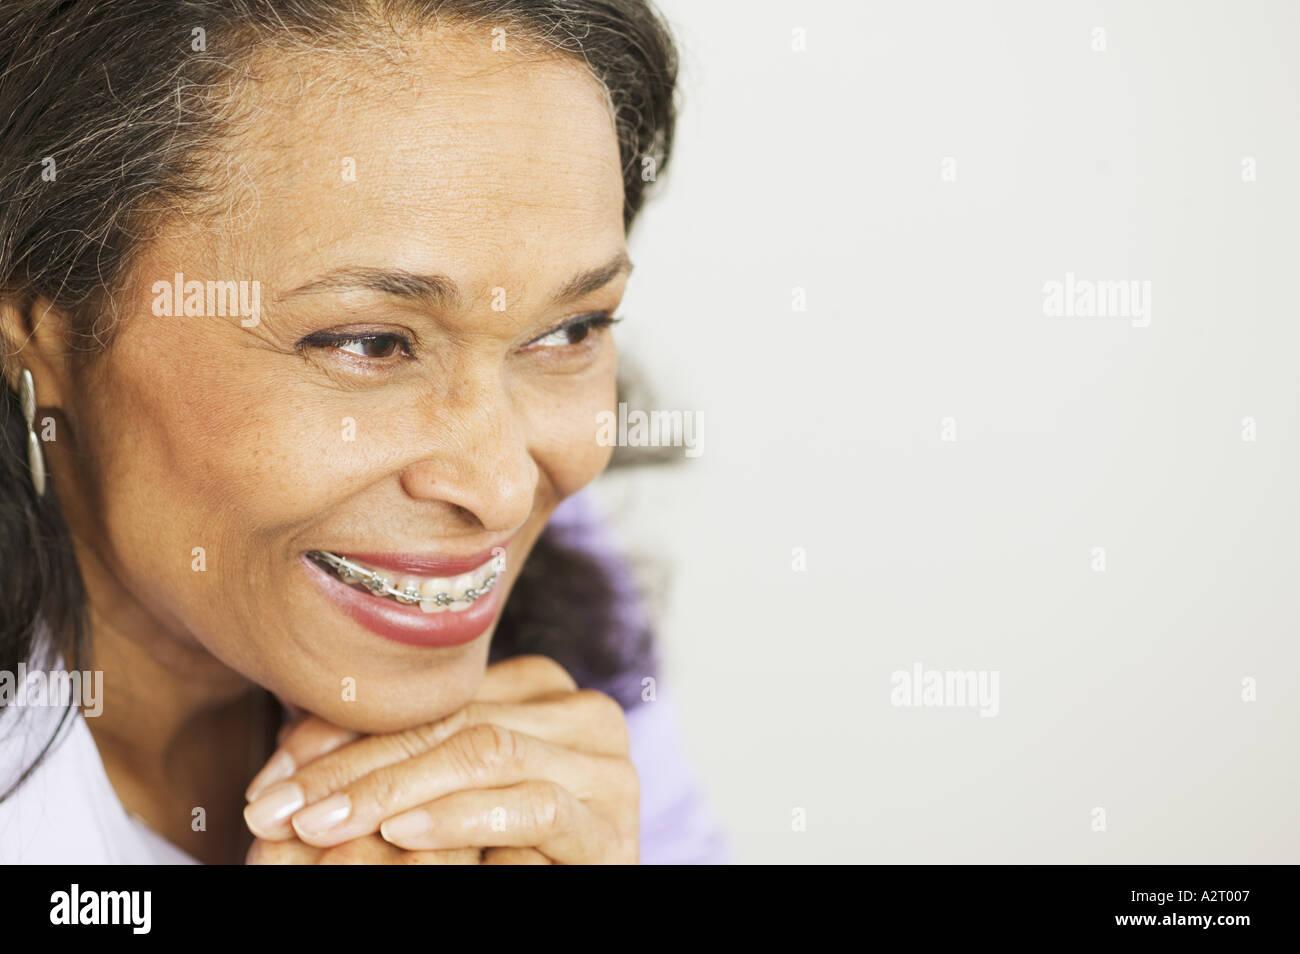 Braces Teeth Woman Stock Photos & Braces Teeth Woman Stock Images ...